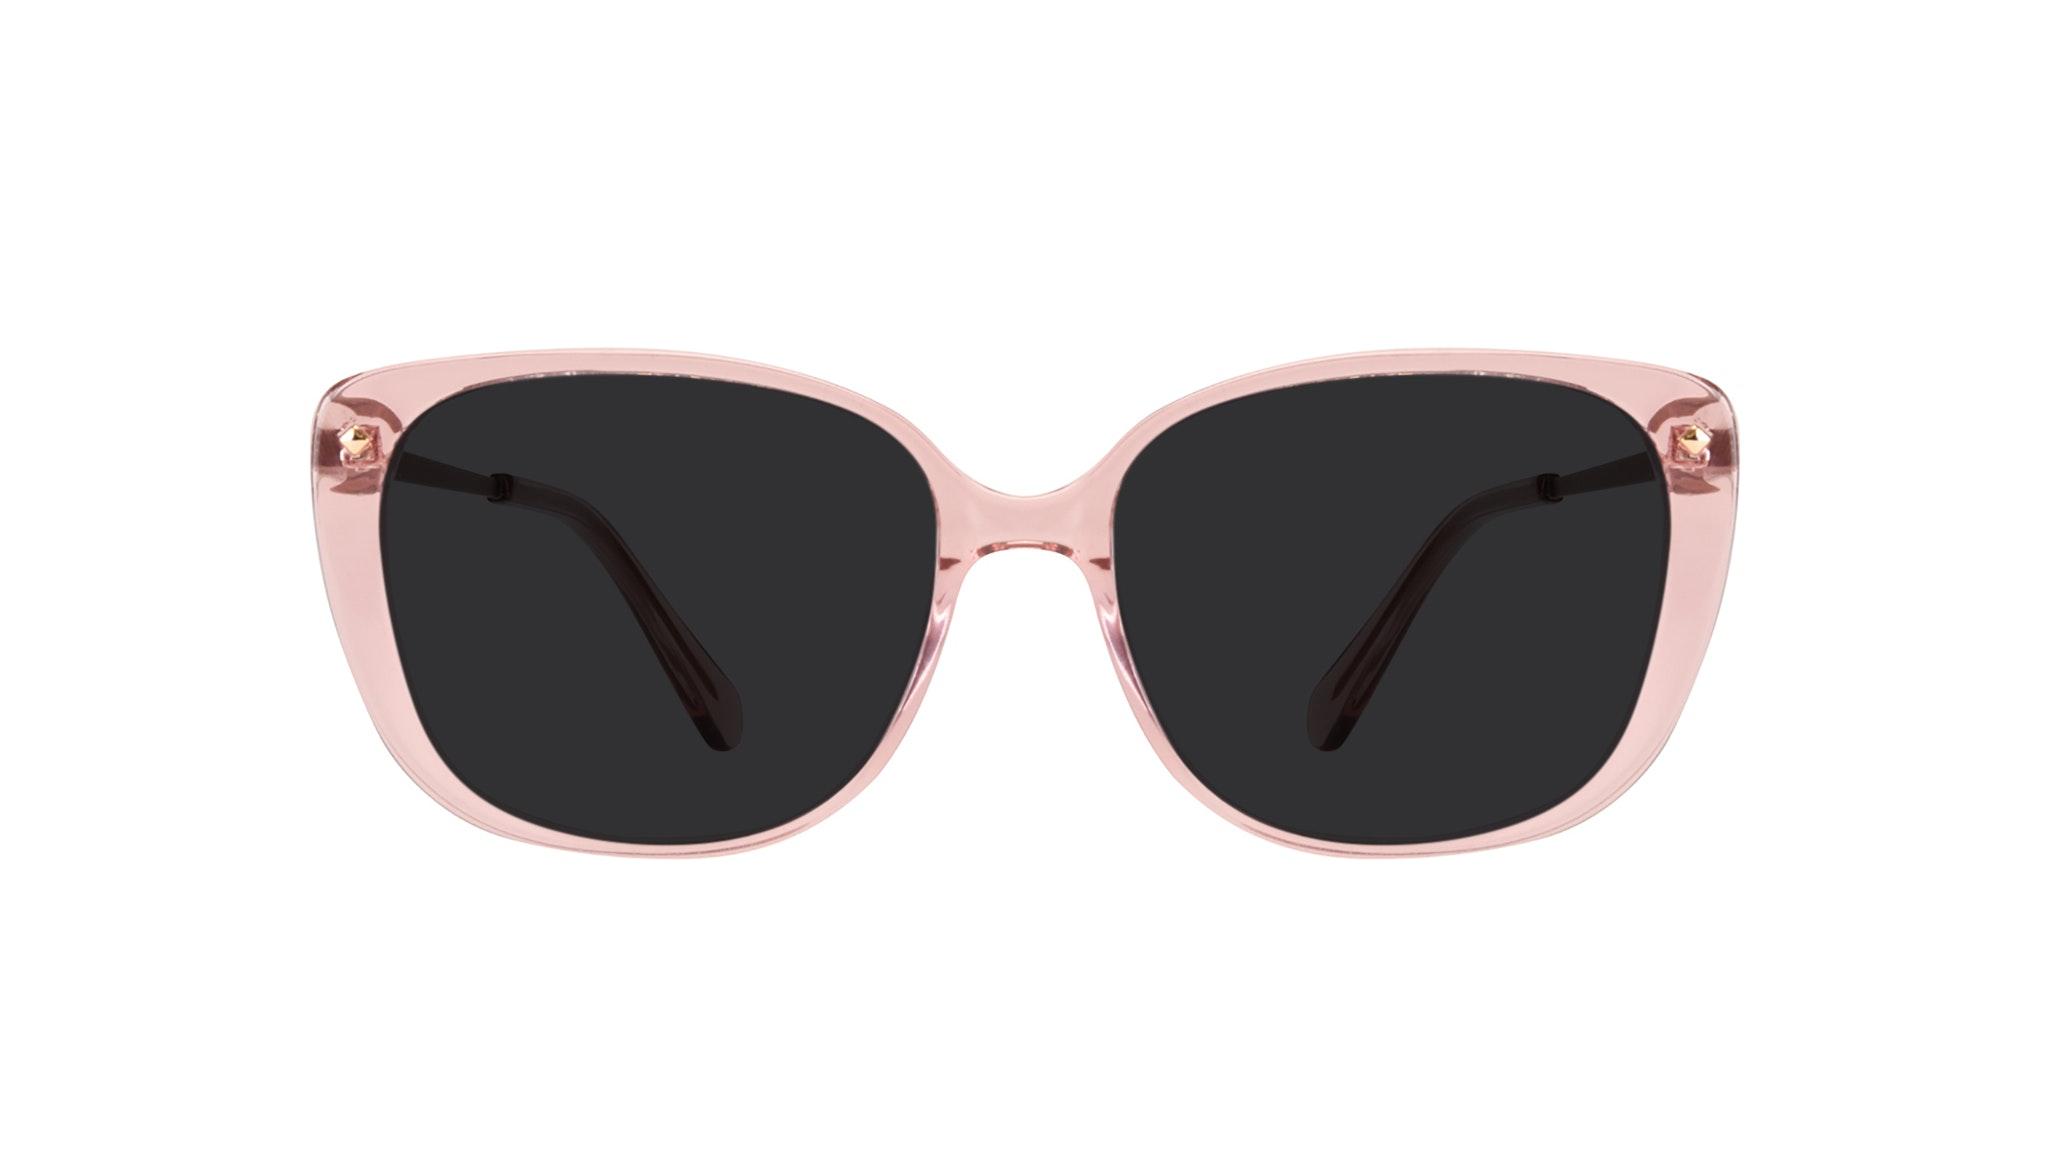 Affordable Fashion Glasses Square Sunglasses Women Japonisme rose